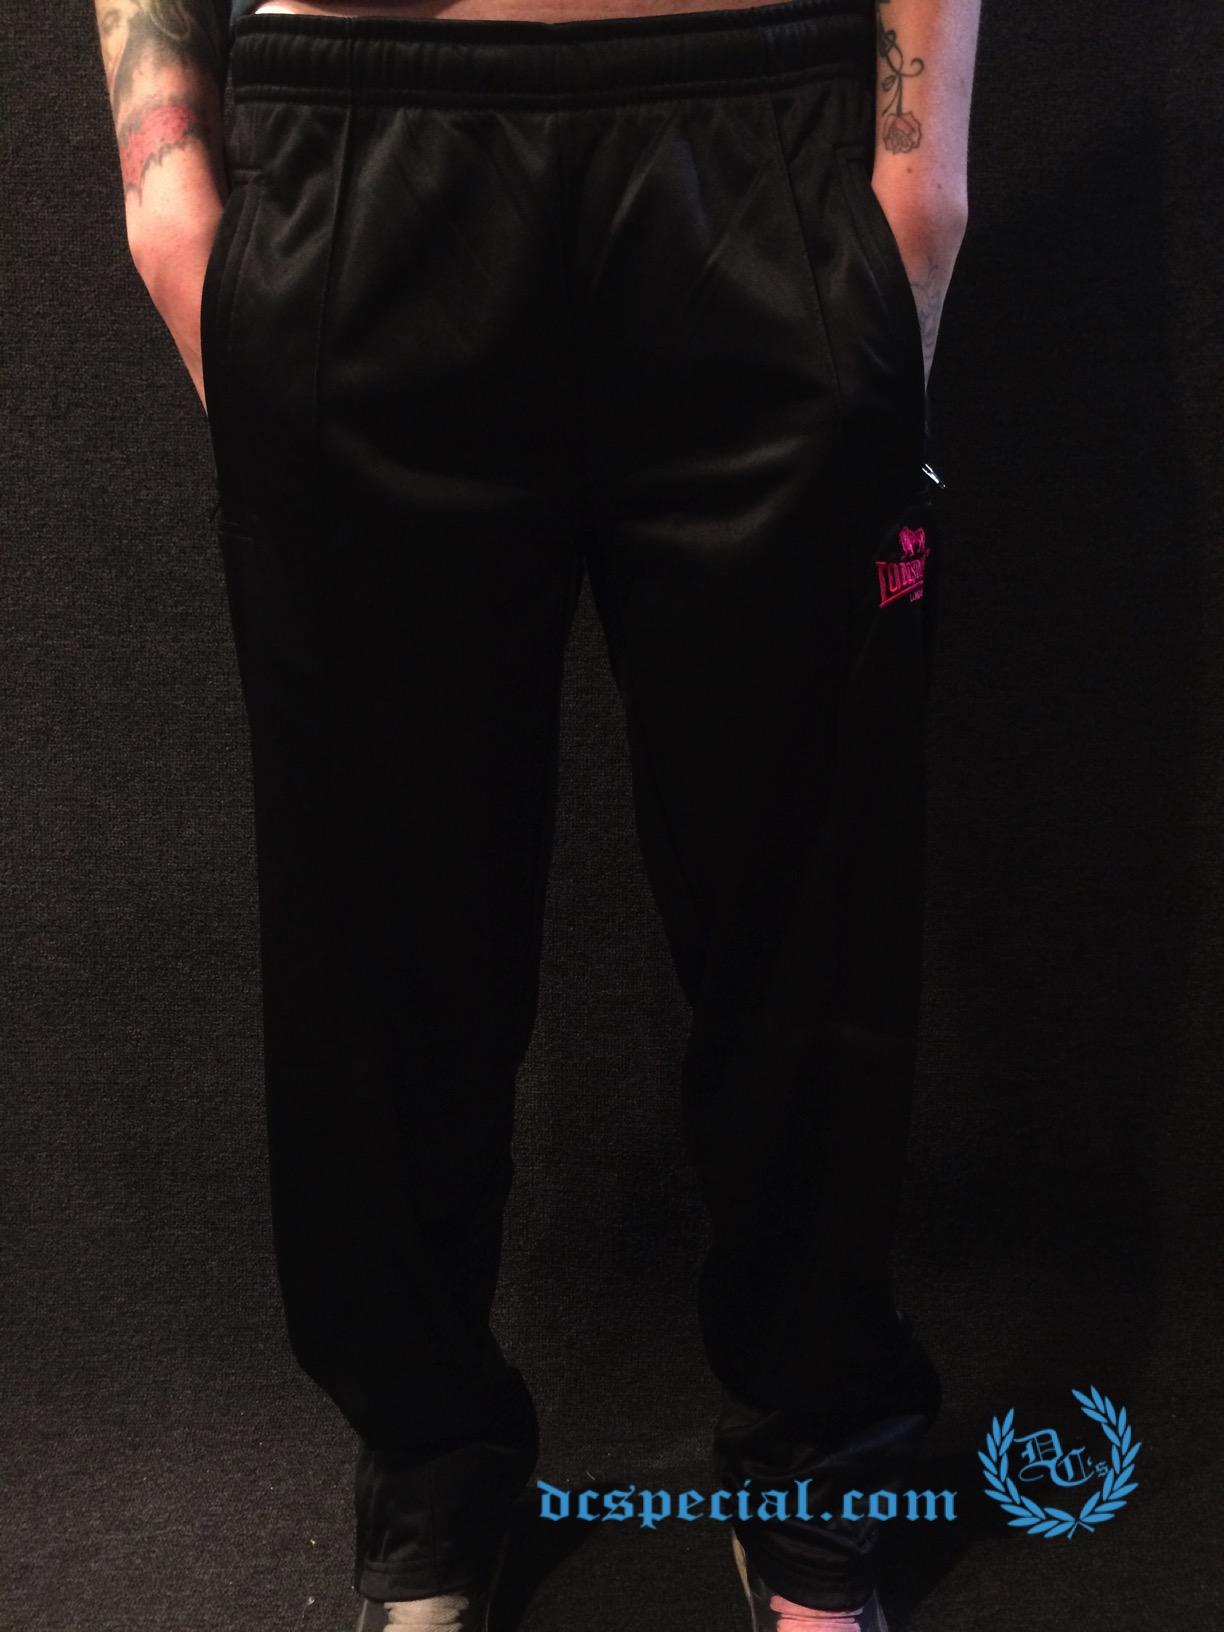 Lonsdale Trainingspants 'Black/Pink'